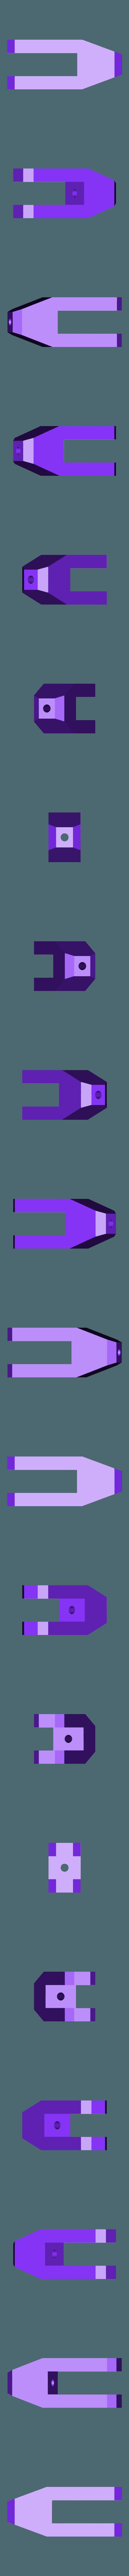 QWIK_SERVO_SHORT_delta.stl Download free OBJ file Horn and qwick links • 3D printable object, PaulDrones